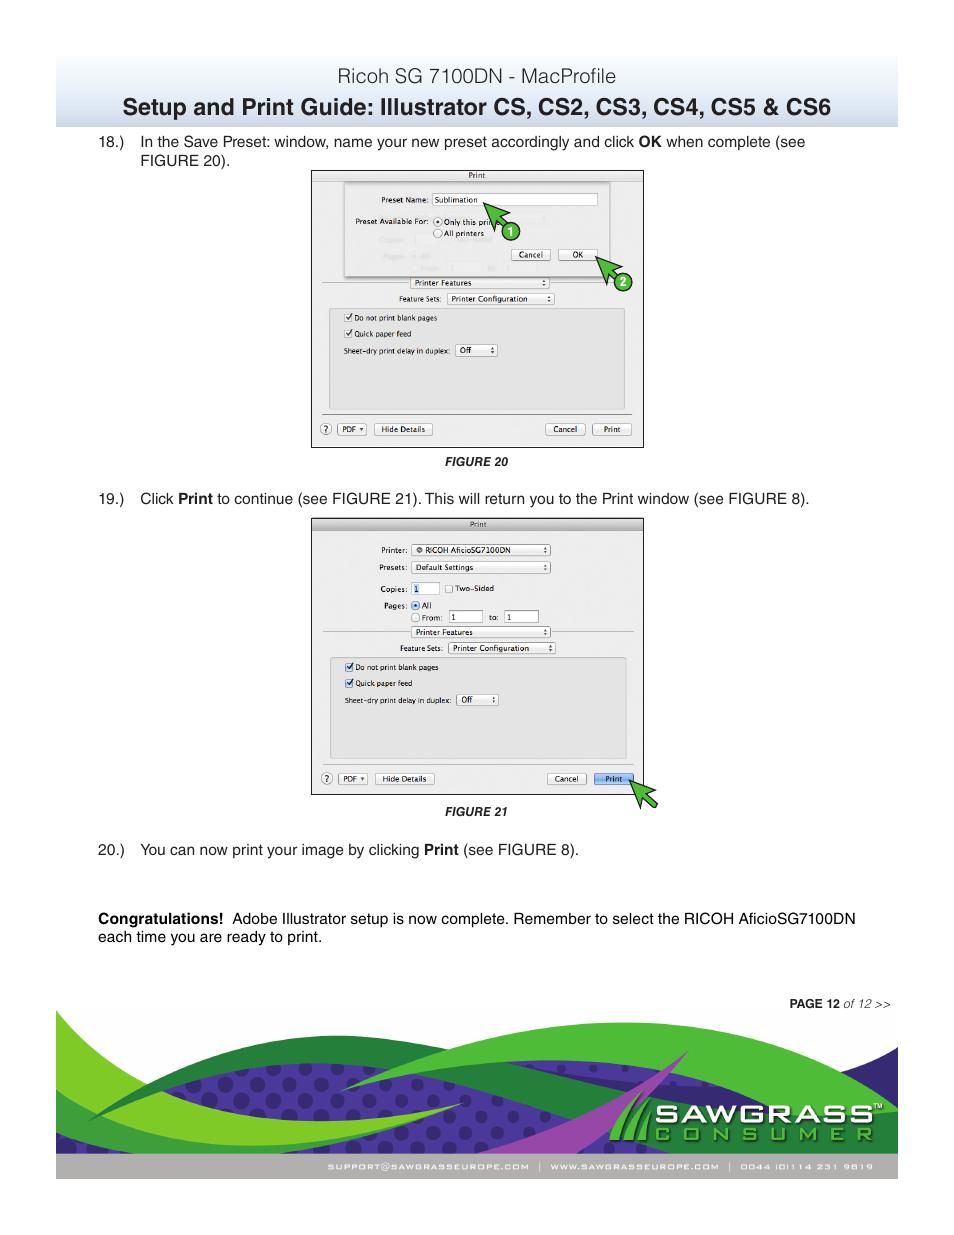 ricoh sg 7100dn macprofile xpres sublijet r ricoh sg7100dn mac rh manualsdir com adobe illustrator cs6 user manual pdf Adobe Premiere Pro CS6